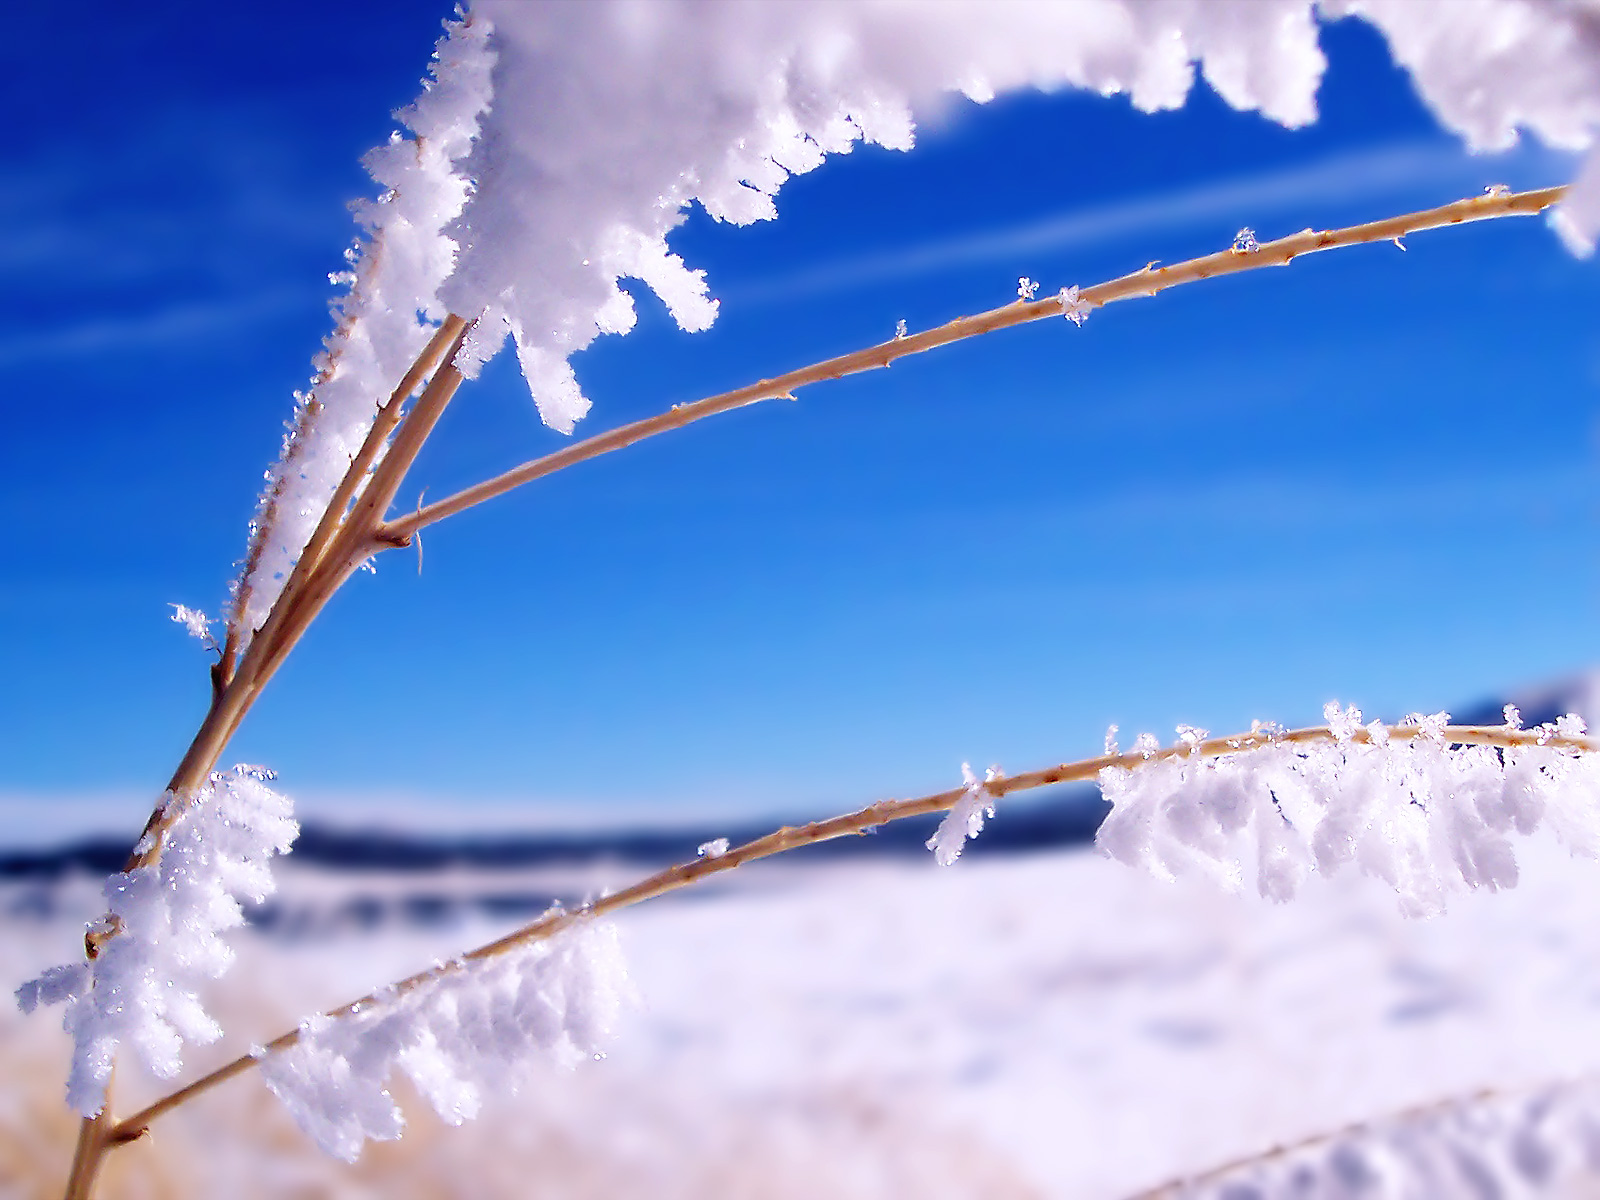 http://2.bp.blogspot.com/-4MpgCHuY6X0/TamTTdhuLXI/AAAAAAAACrE/t3IS8zOKypg/s1600/winter+scenes+1+%252819%2529.jpg